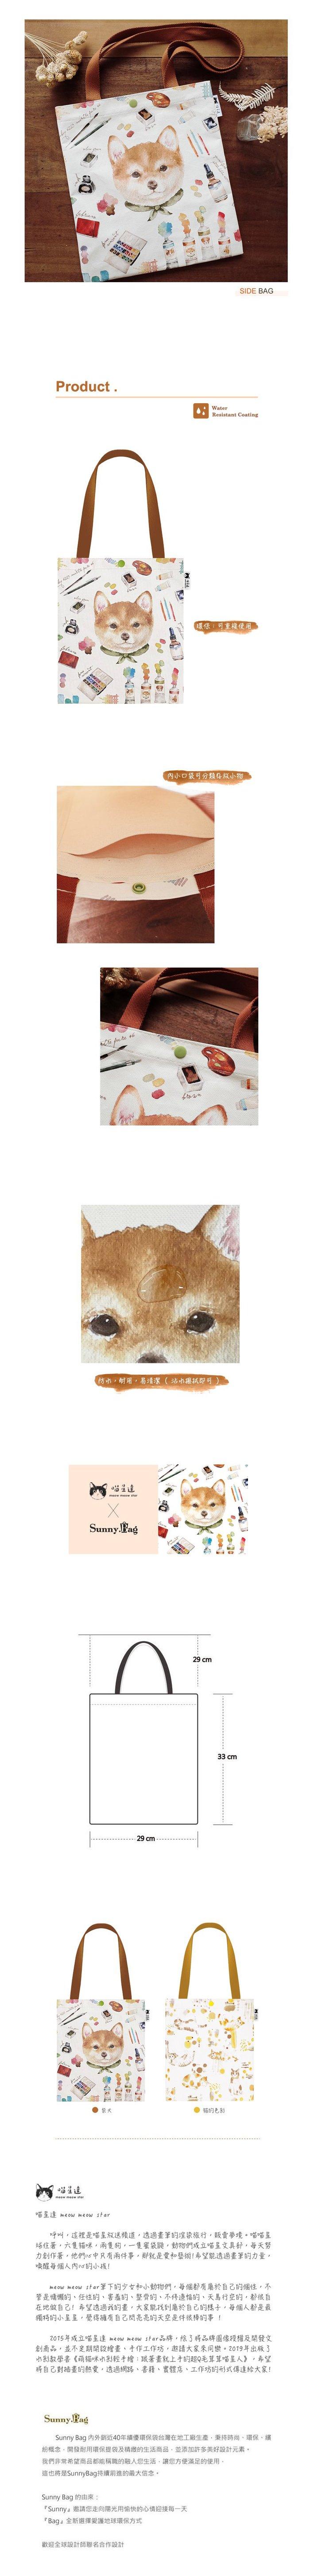 (複製)Sunny Bag|喵星達-文具病拉鍊購物袋